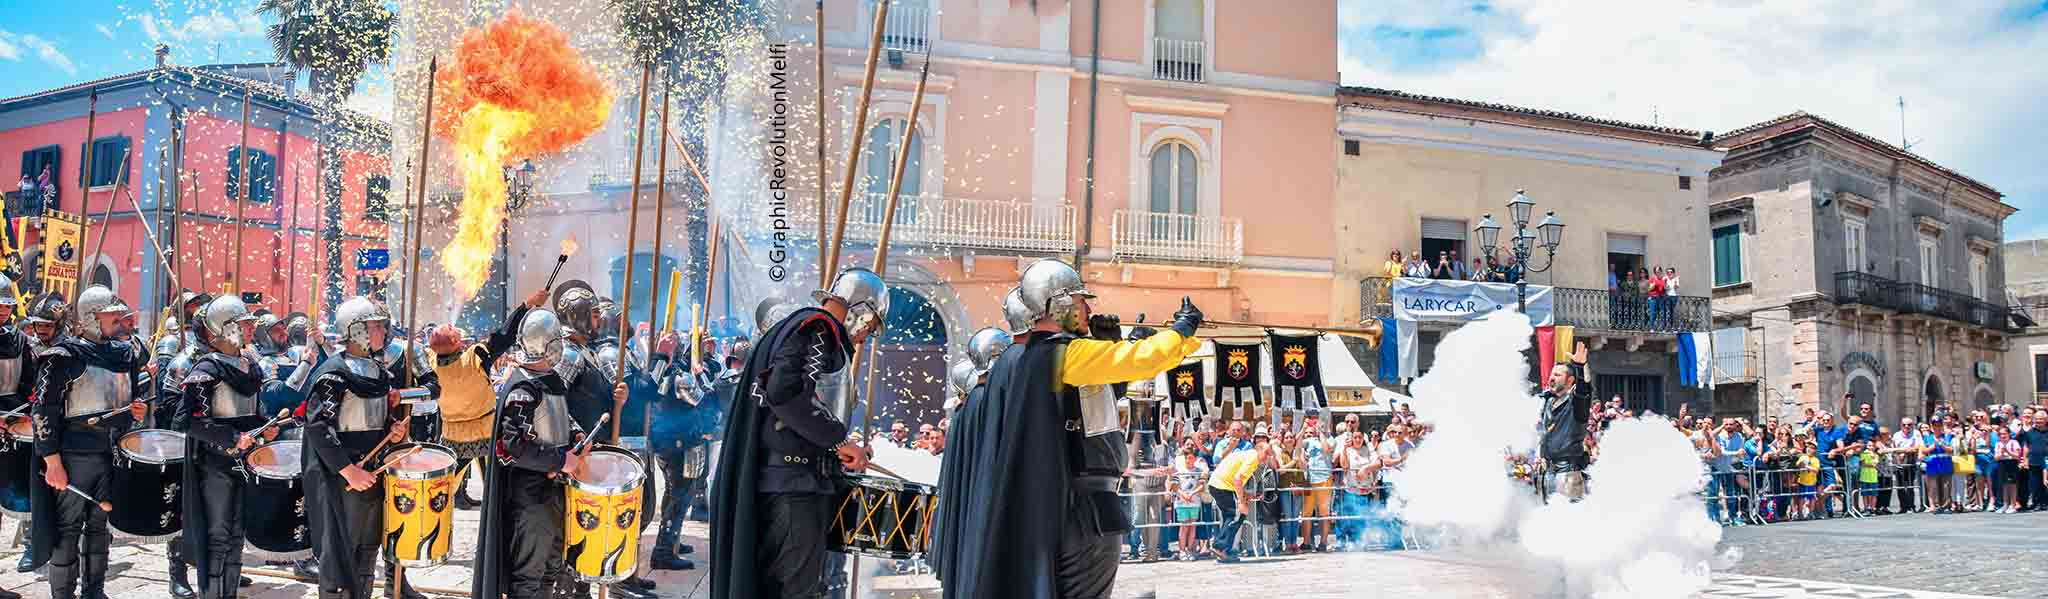 pentecoste melfi pasqua di sangue presa porta venosina assedio castello archibugieri trombonieri senatore